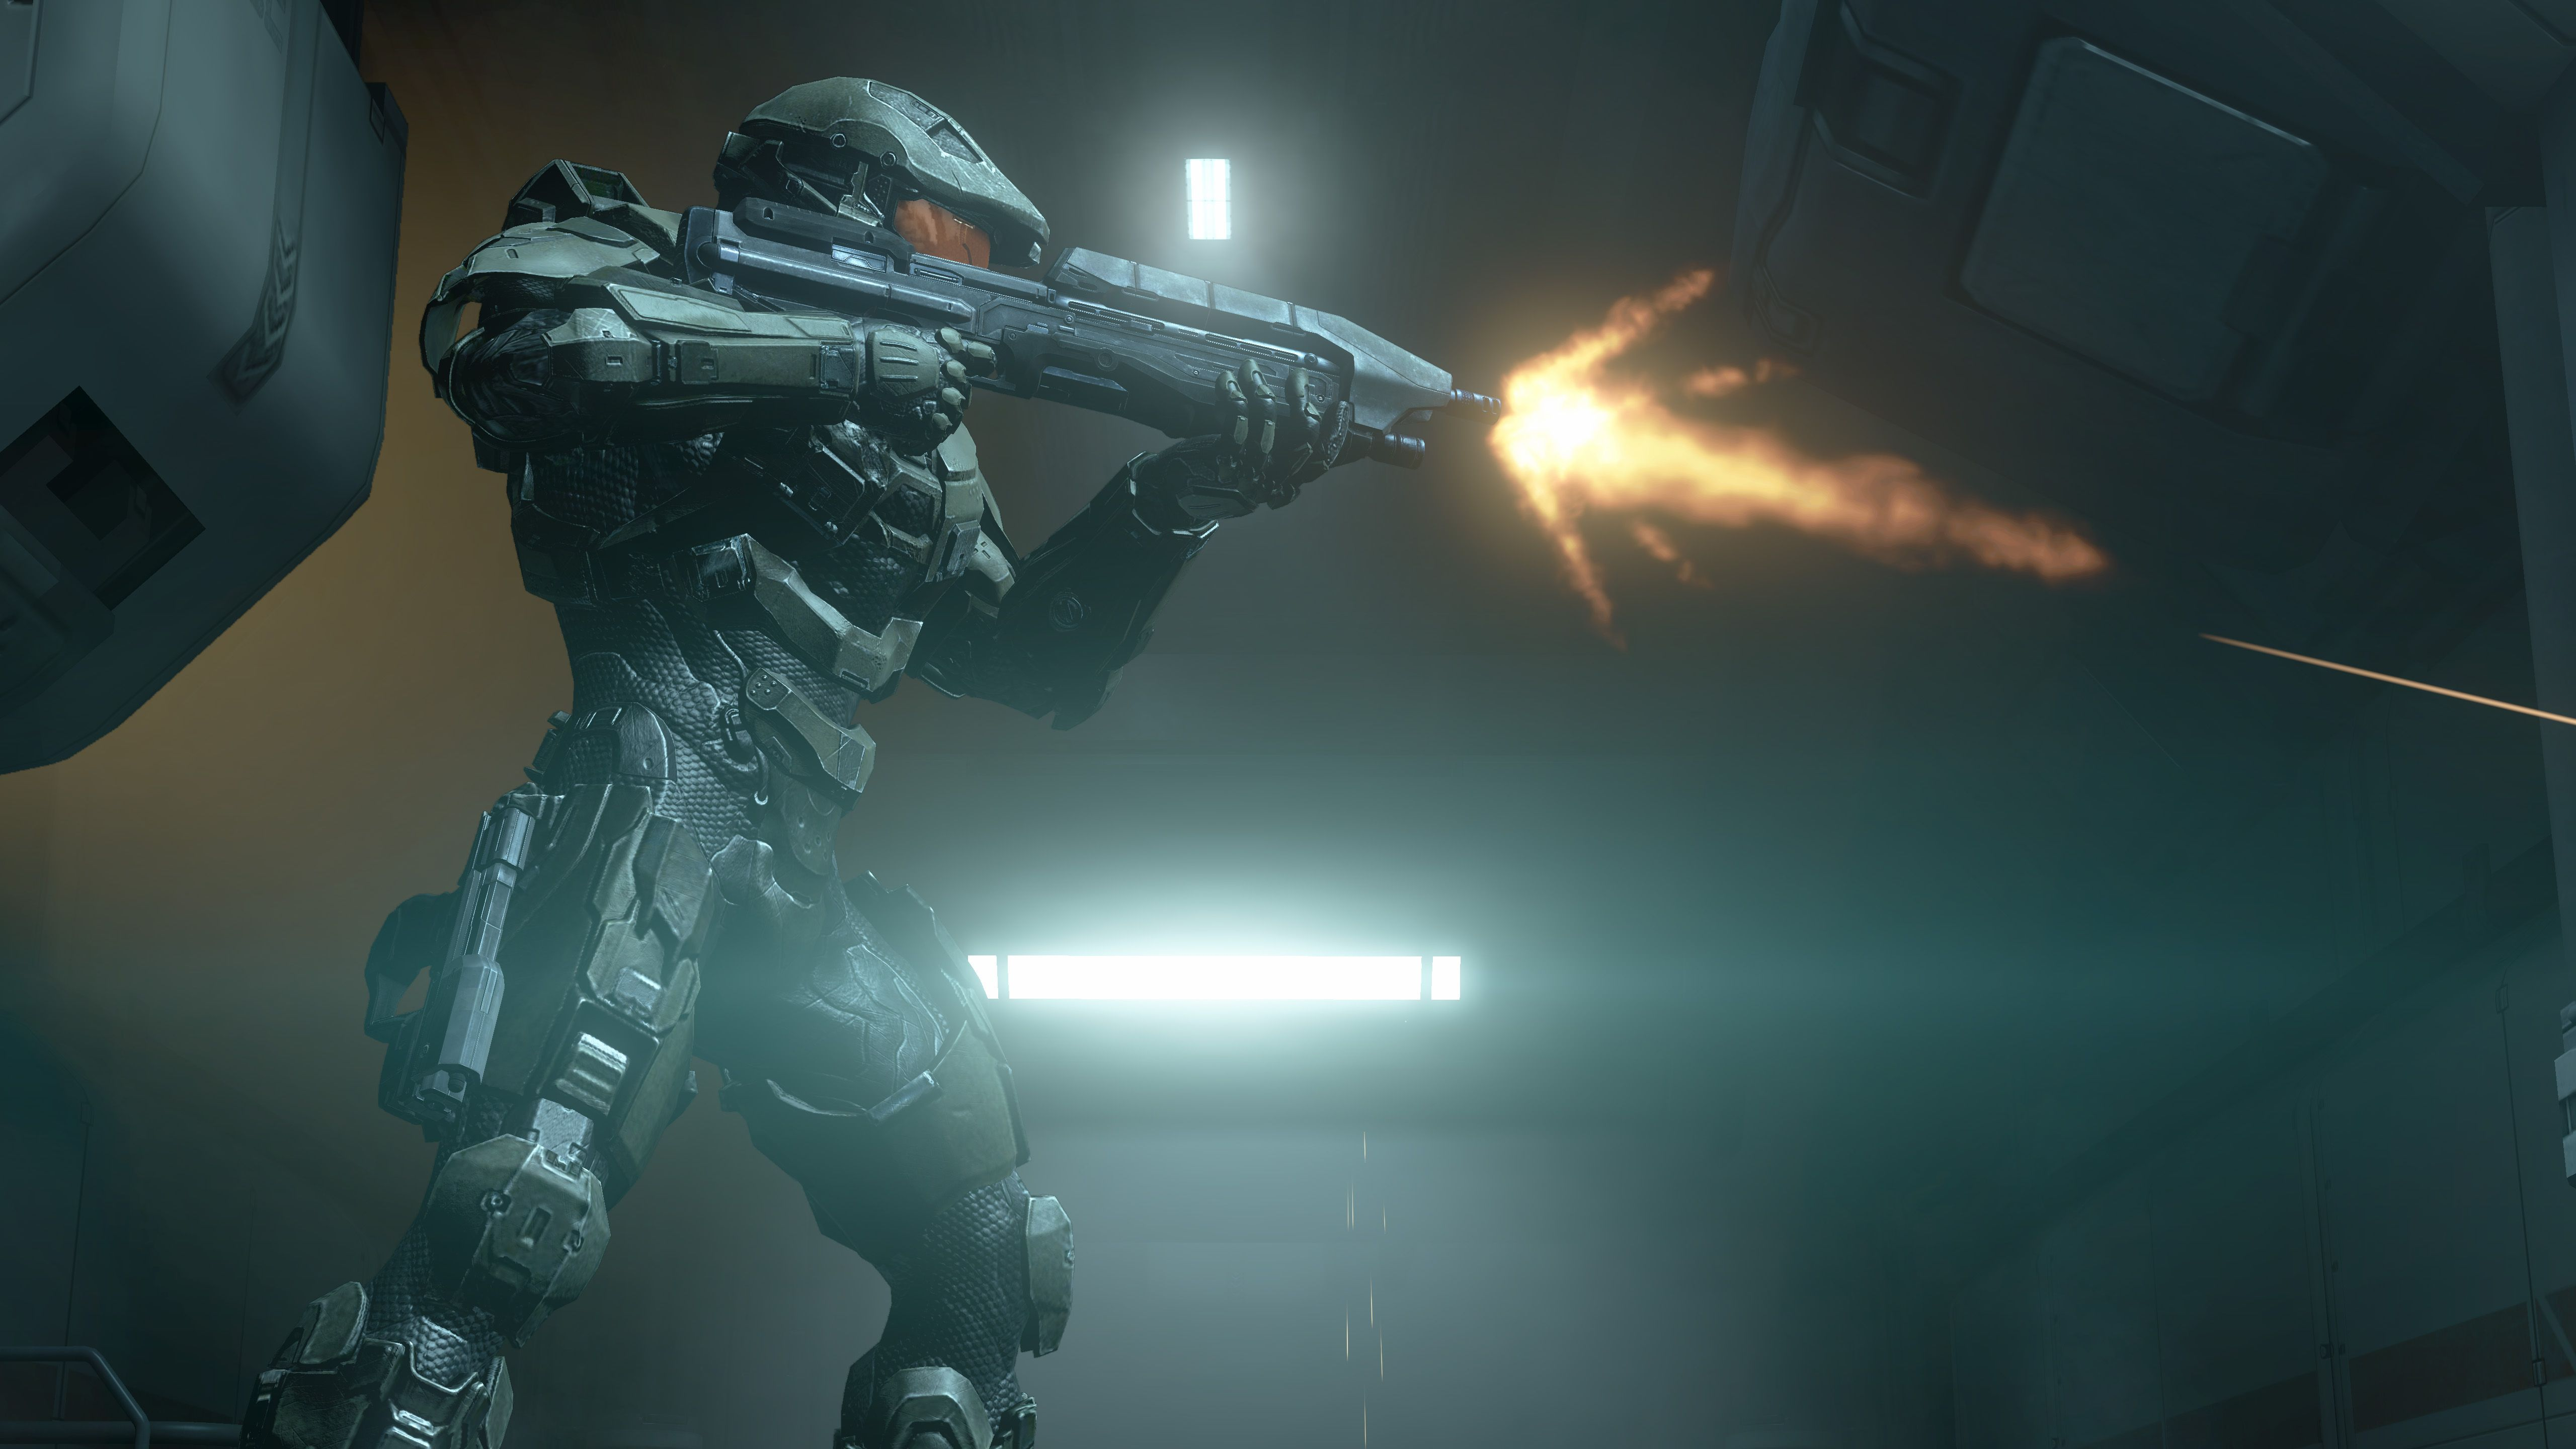 Halo 4 - Halo 4 5K